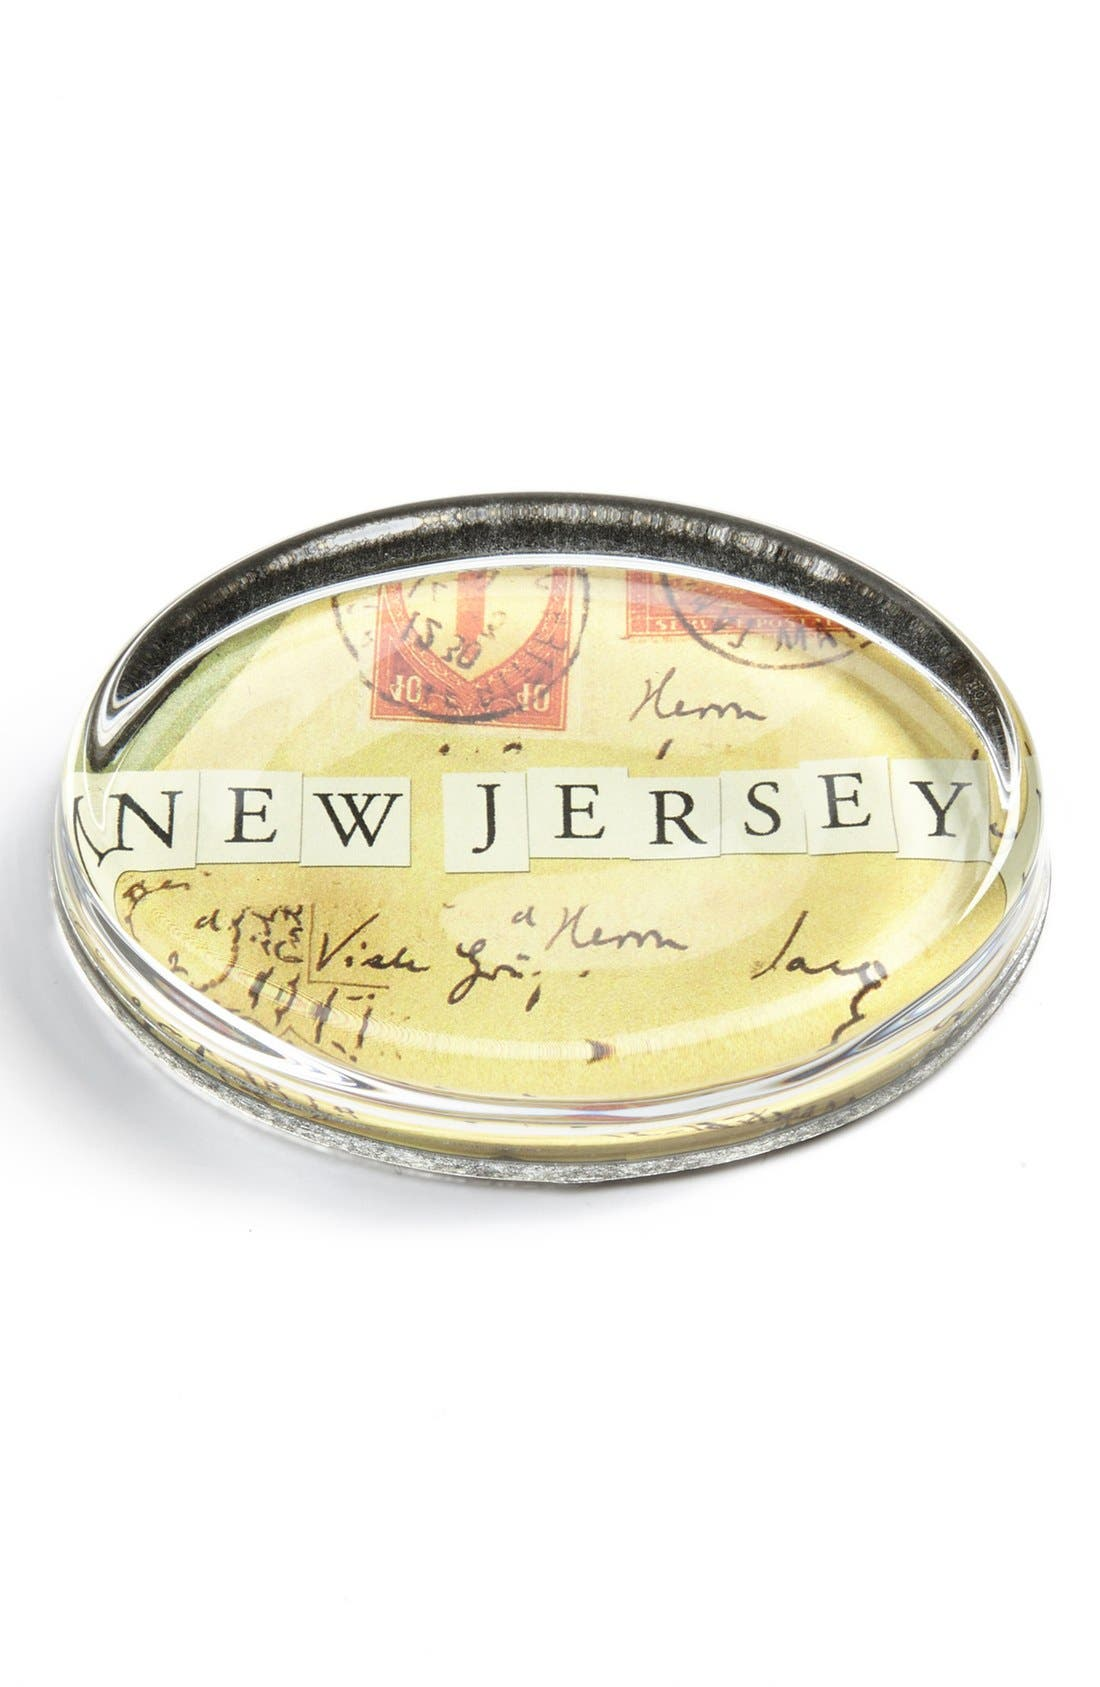 Main Image - Ben's Garden 'New Jersey' Paperweight